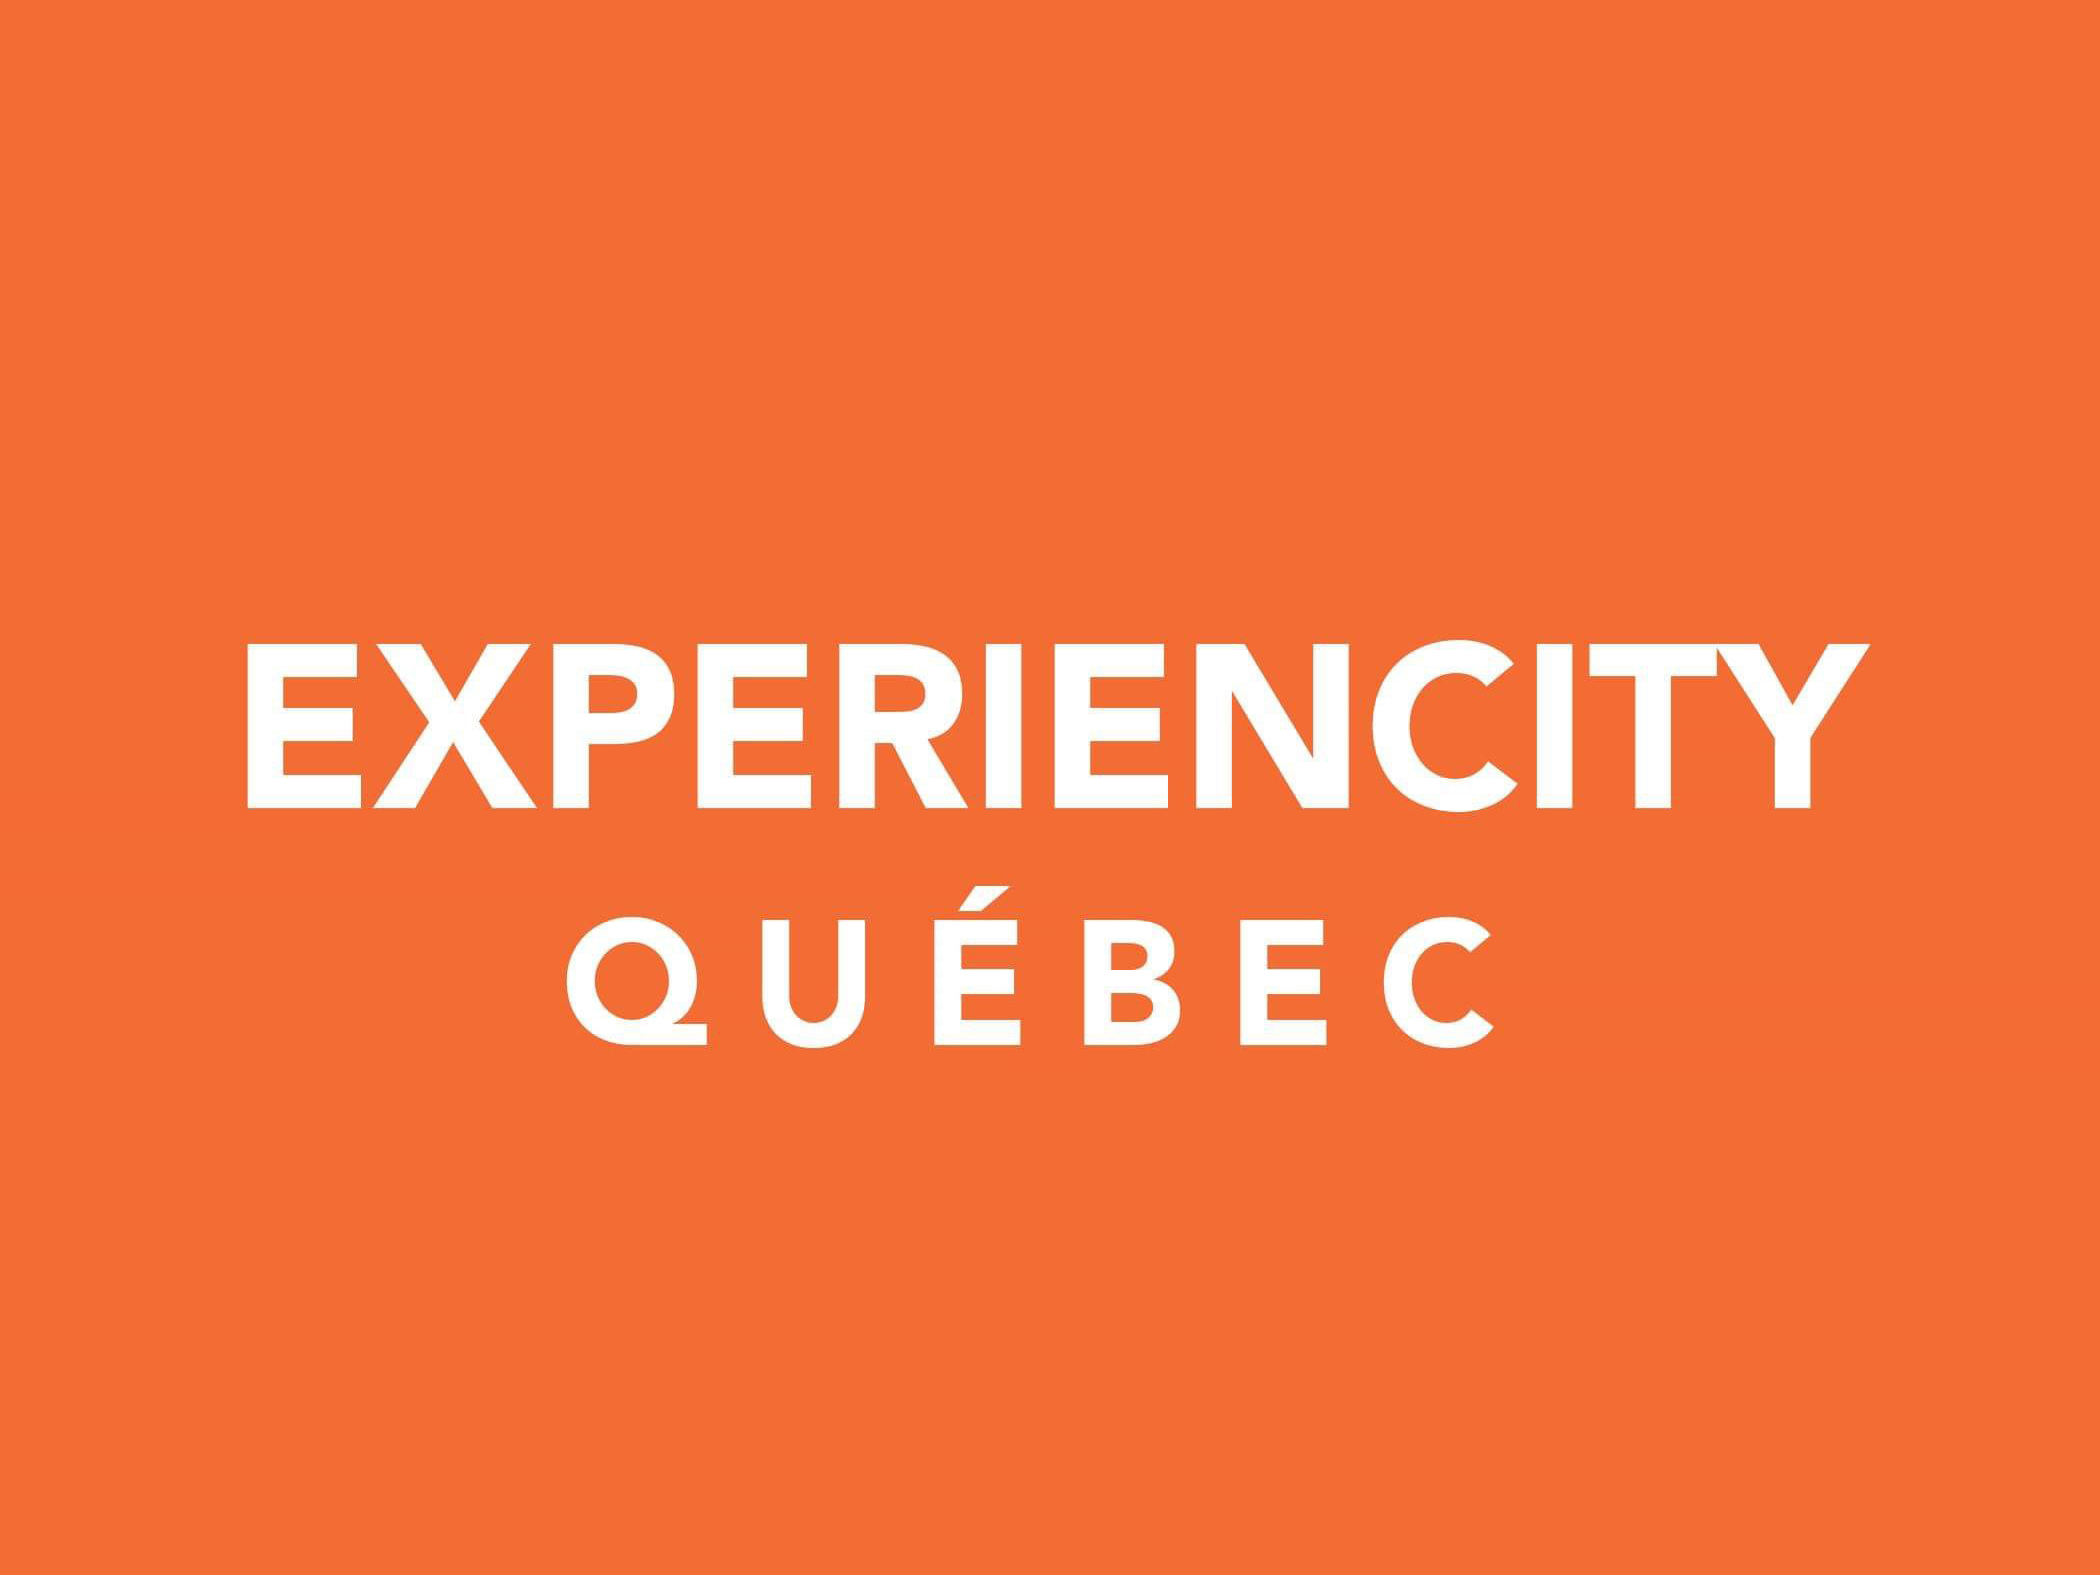 Experiencity Québec